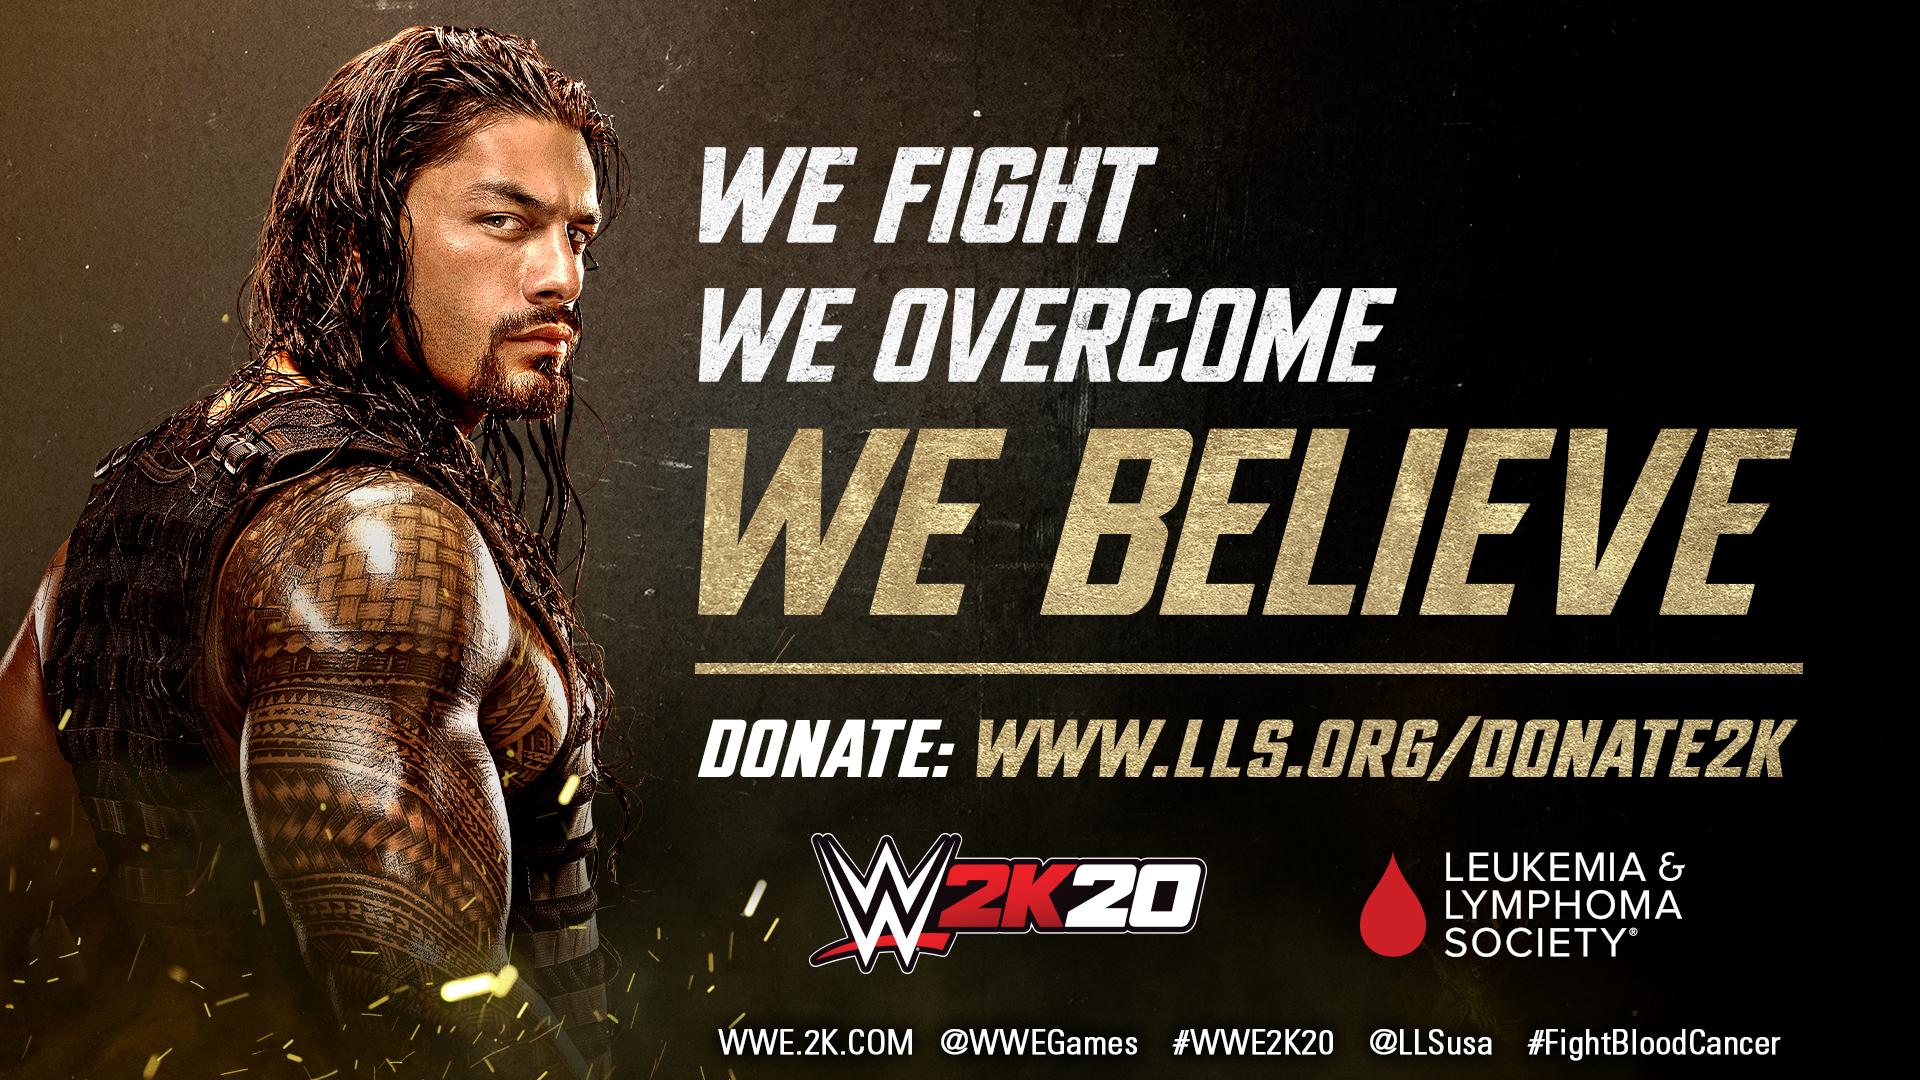 WWE 2K – global partnership with The Leukemia & Lymphoma